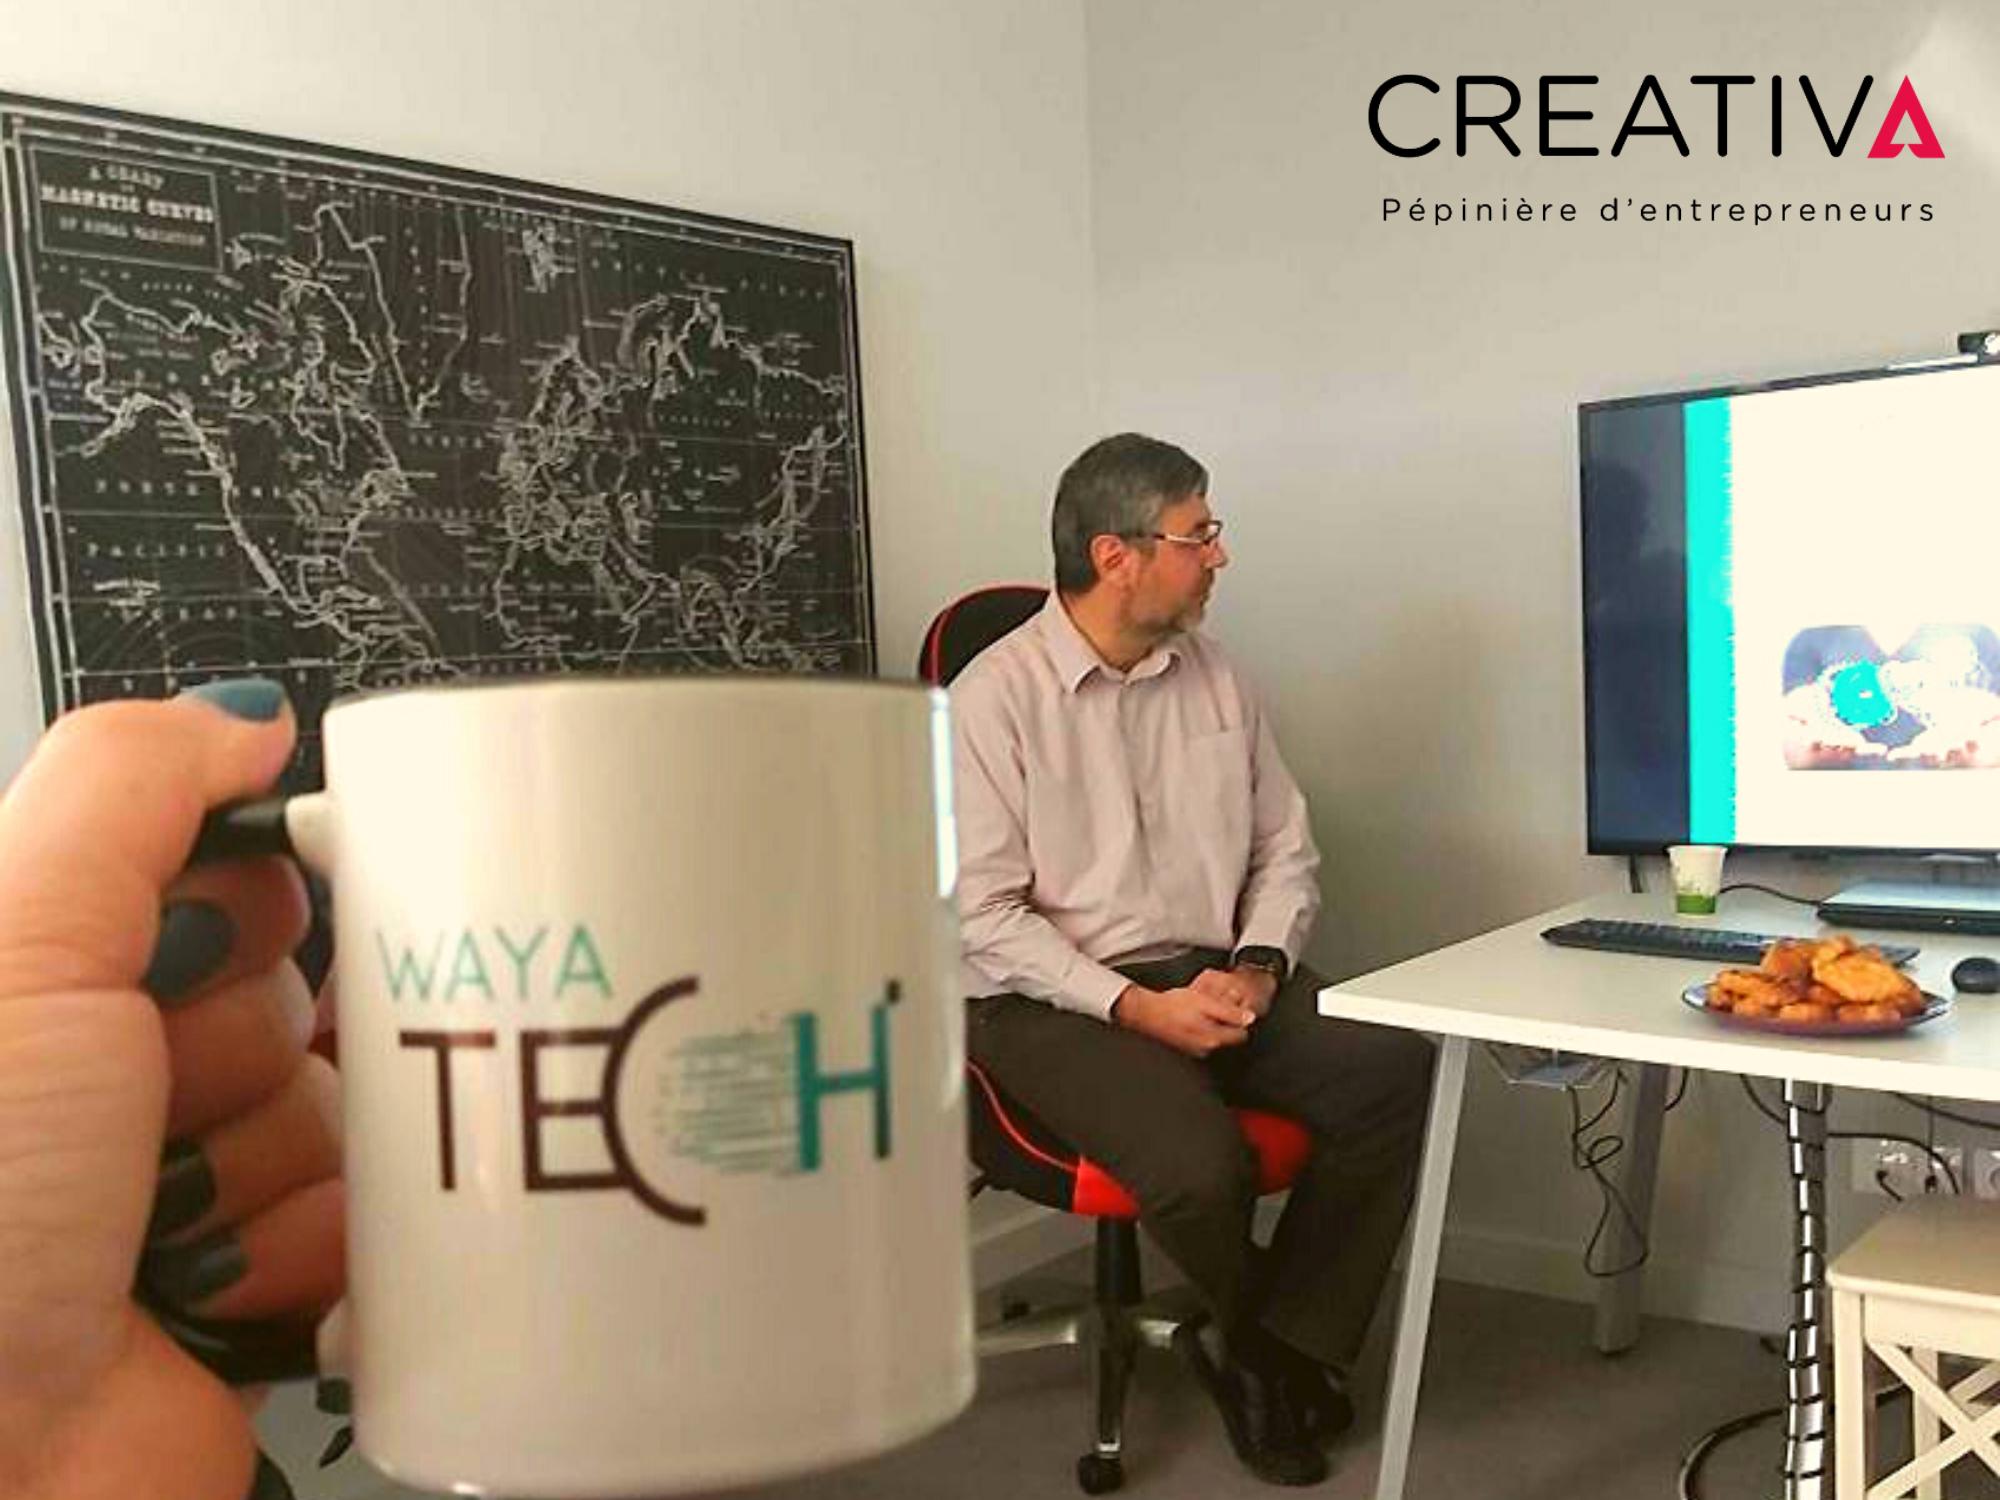 Waya tech rencontre Créativa Avignon